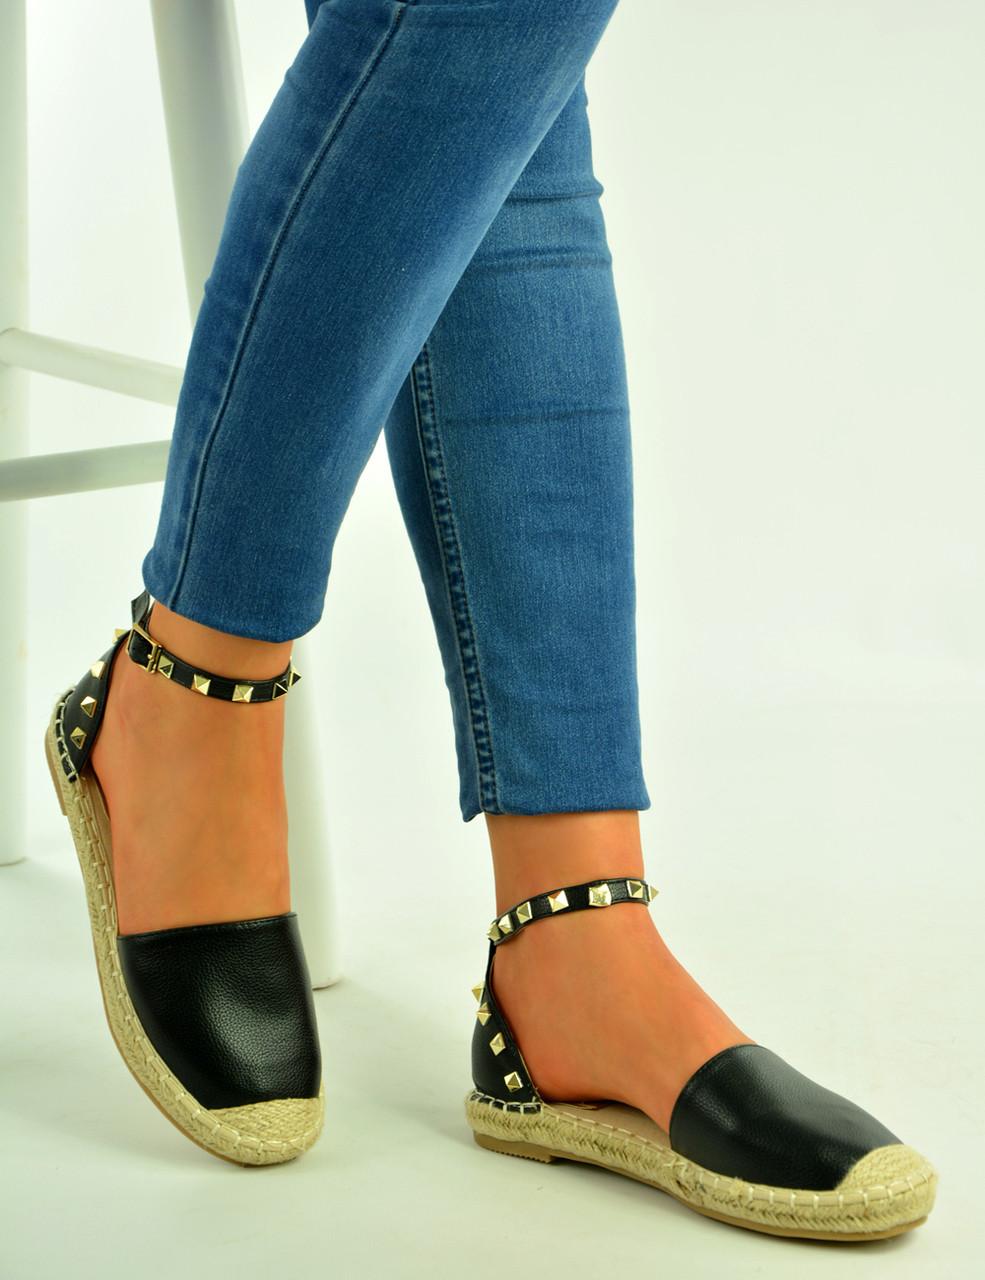 b4e0092fbea Black Pu Ankle Strap Rock Stud Espadrilles